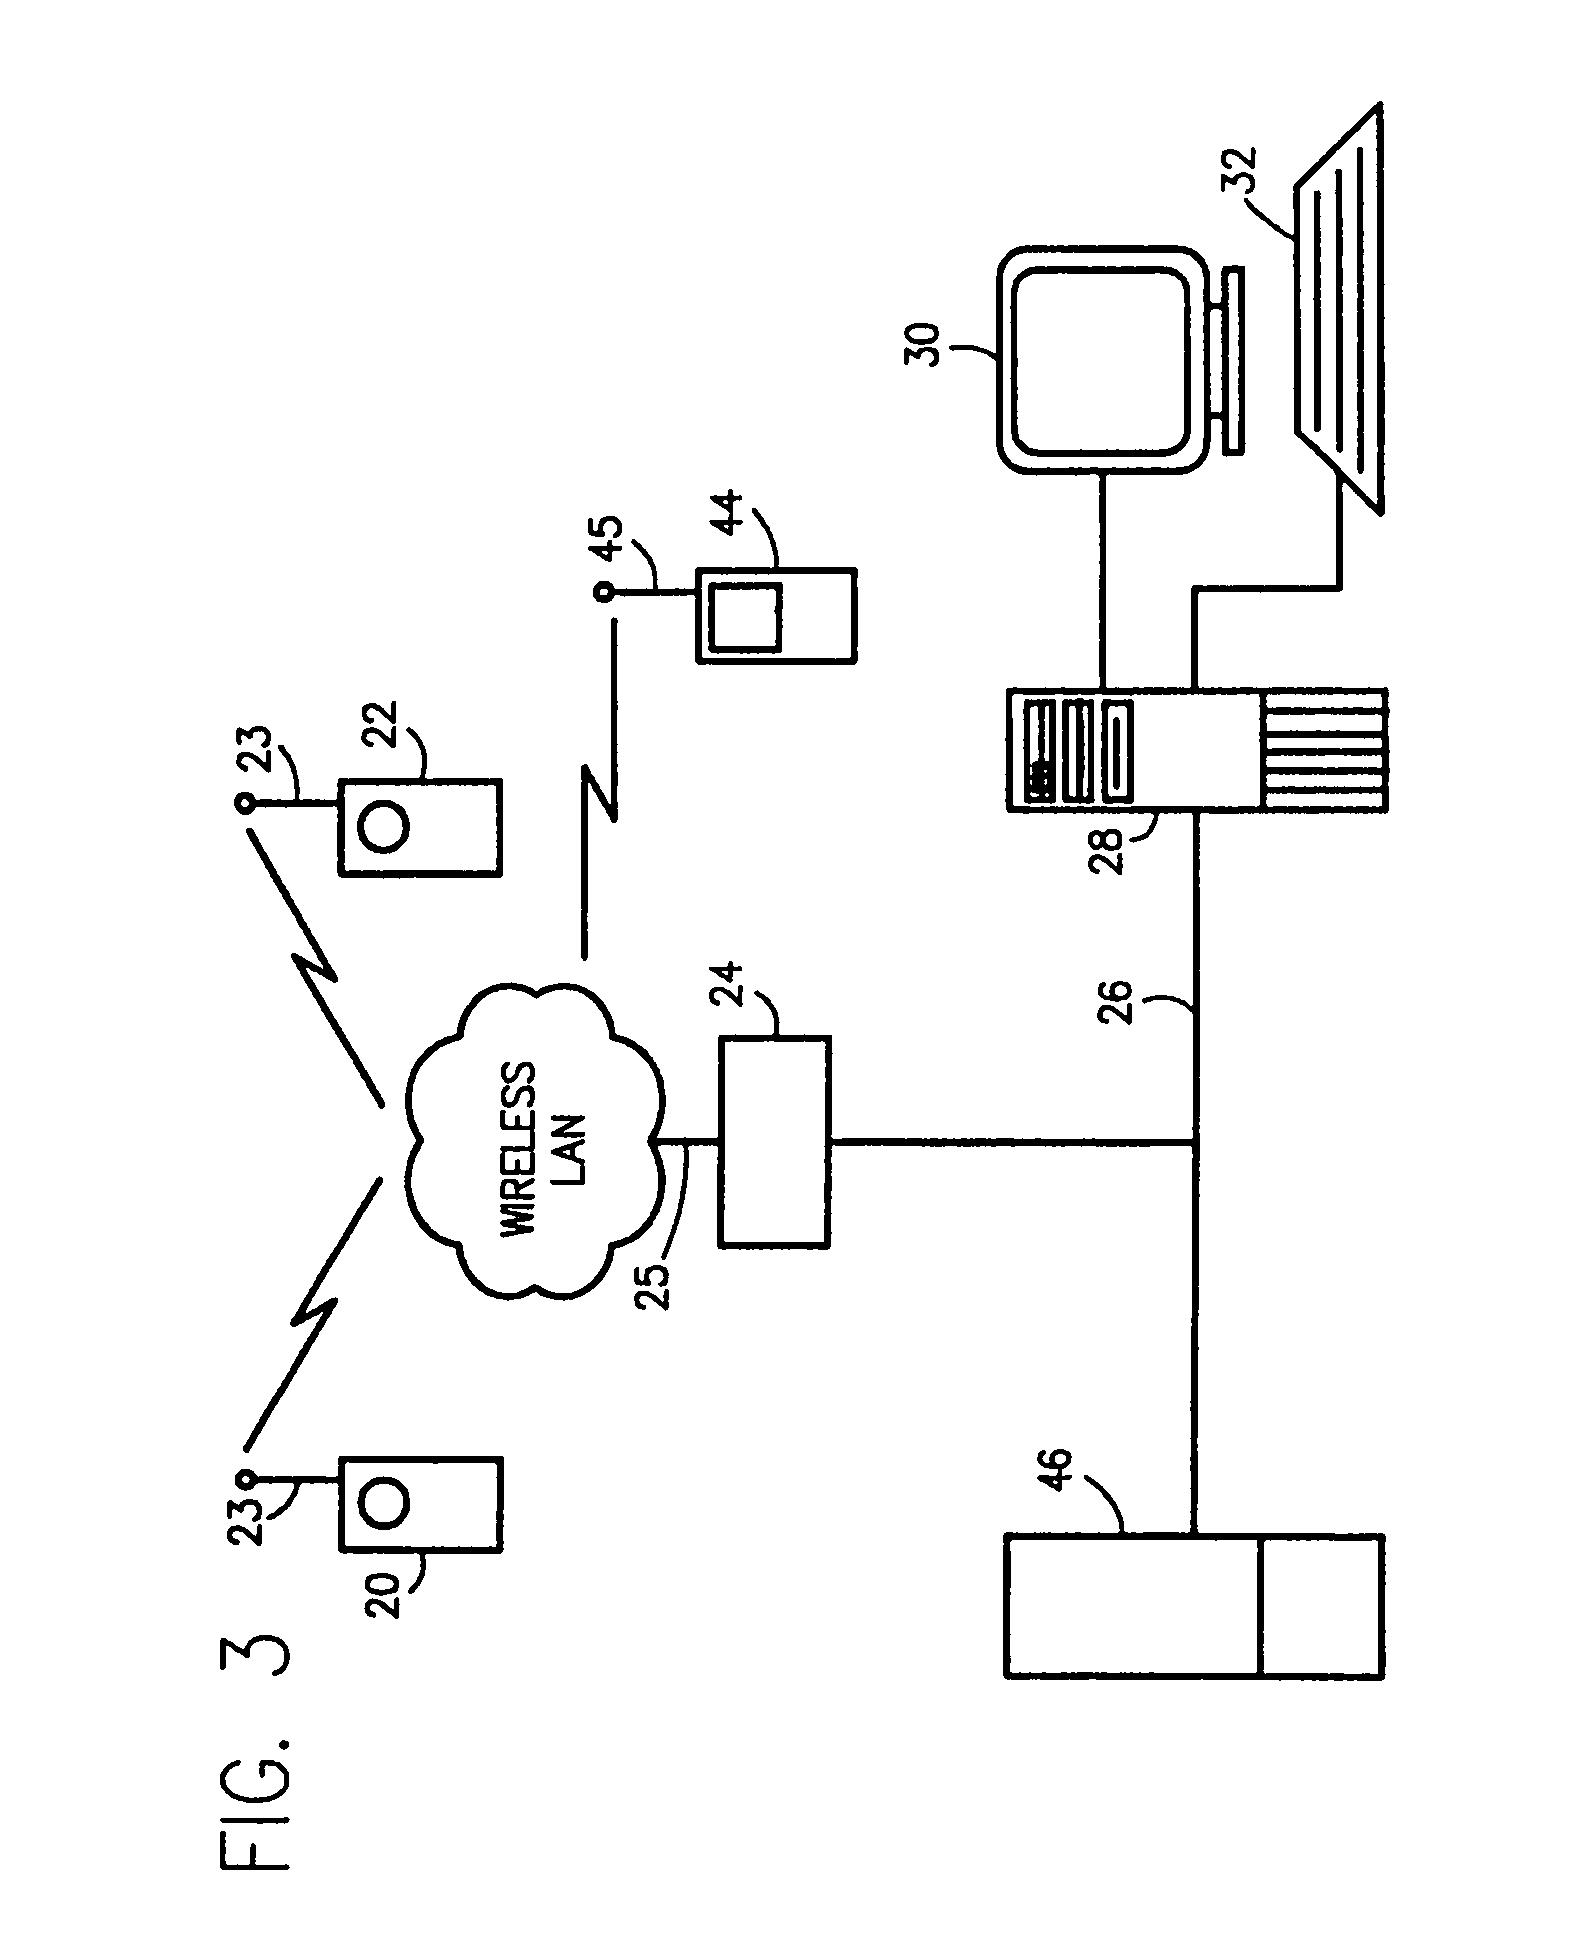 Patent Us 6970183 B1 Sensormatic Ptz Camera Wiring Diagram